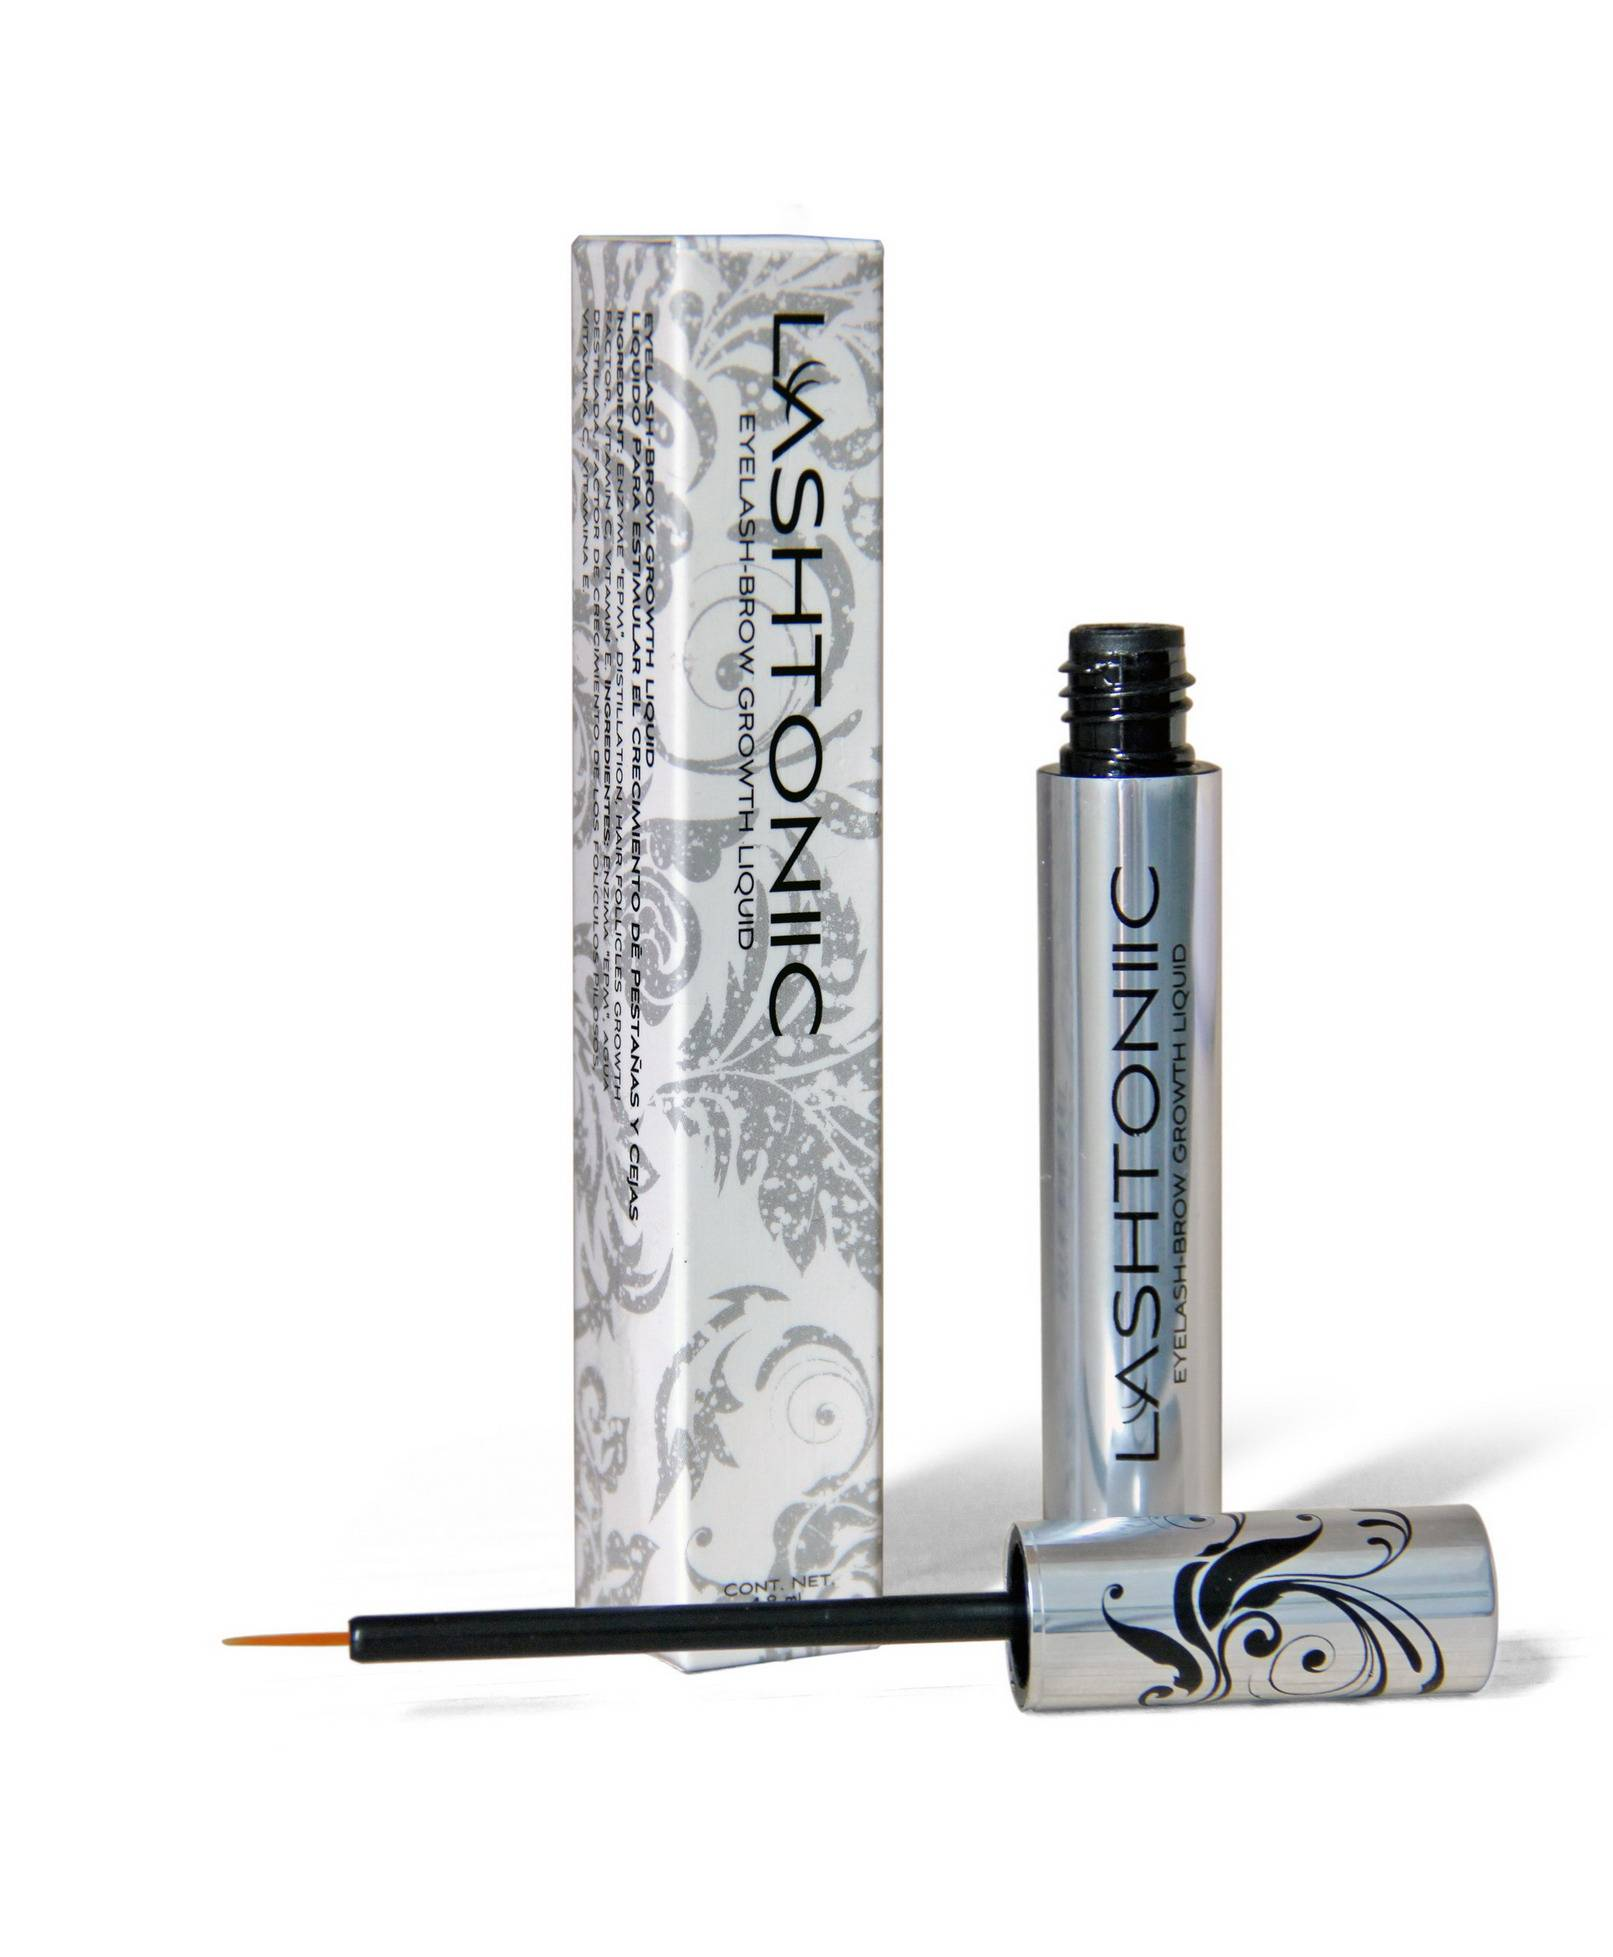 lashtoniic eyelash growth liquid